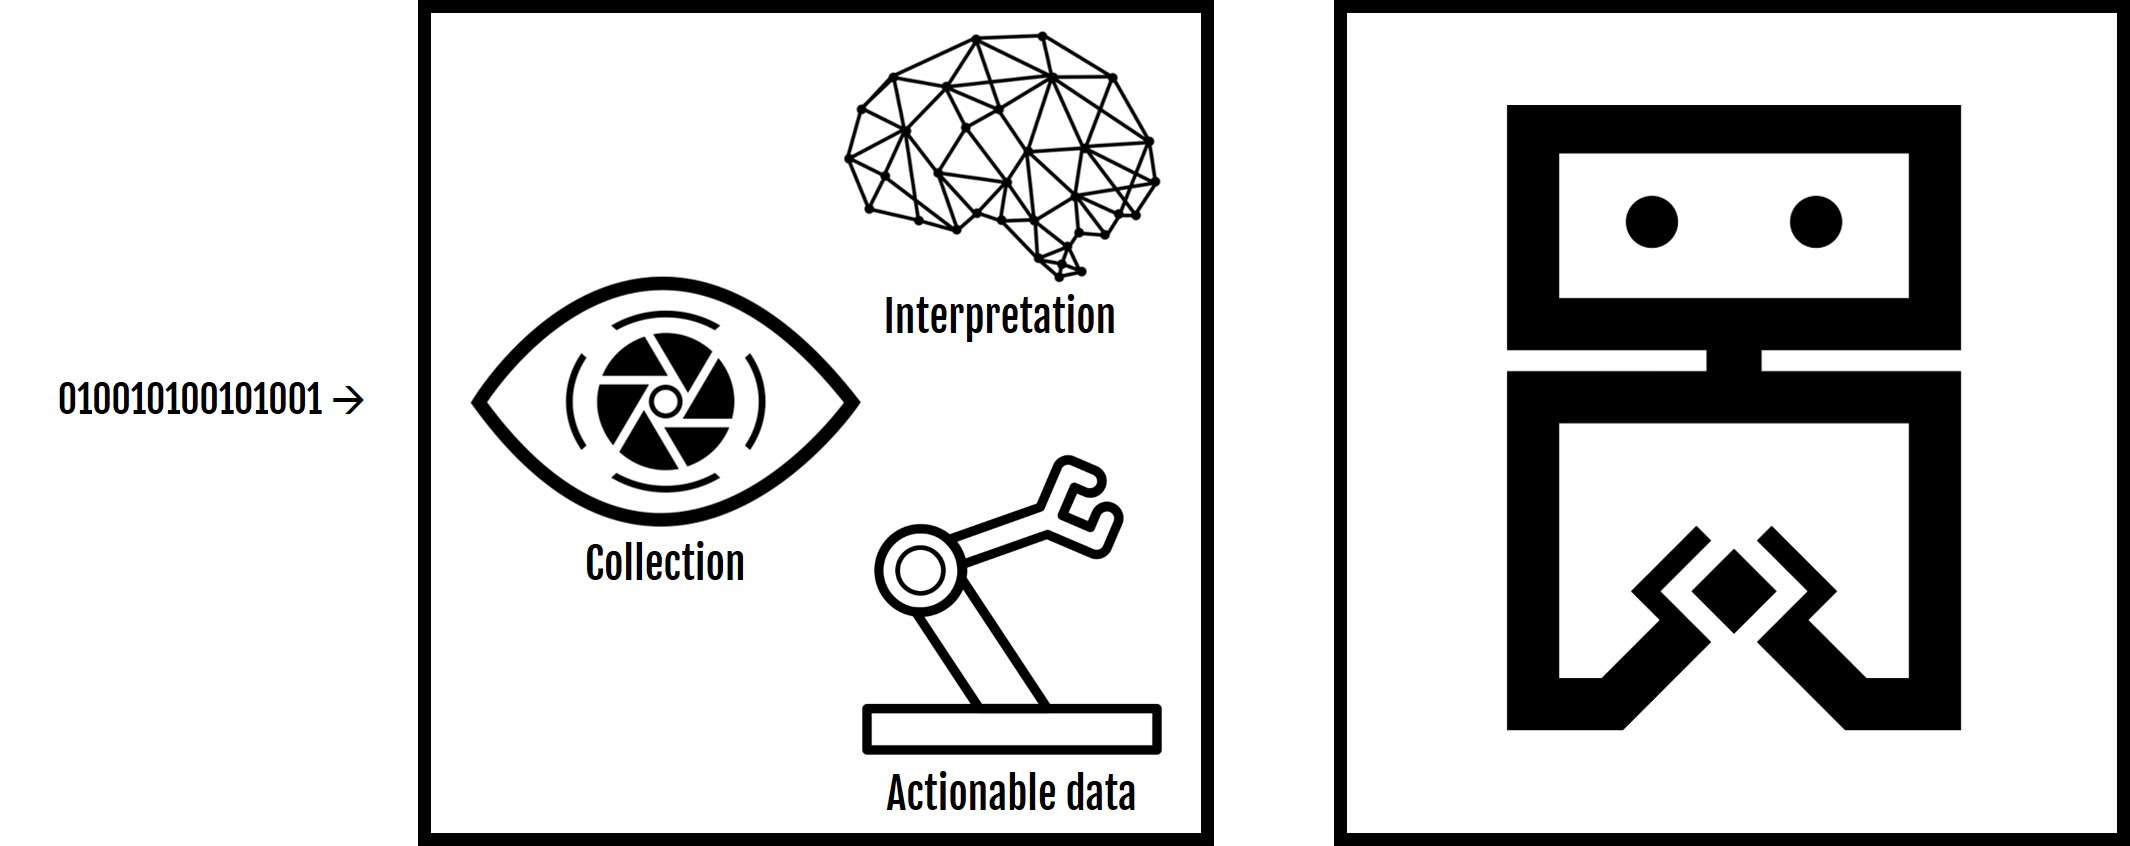 11-a-new-kind-of-perception-3_no-logo